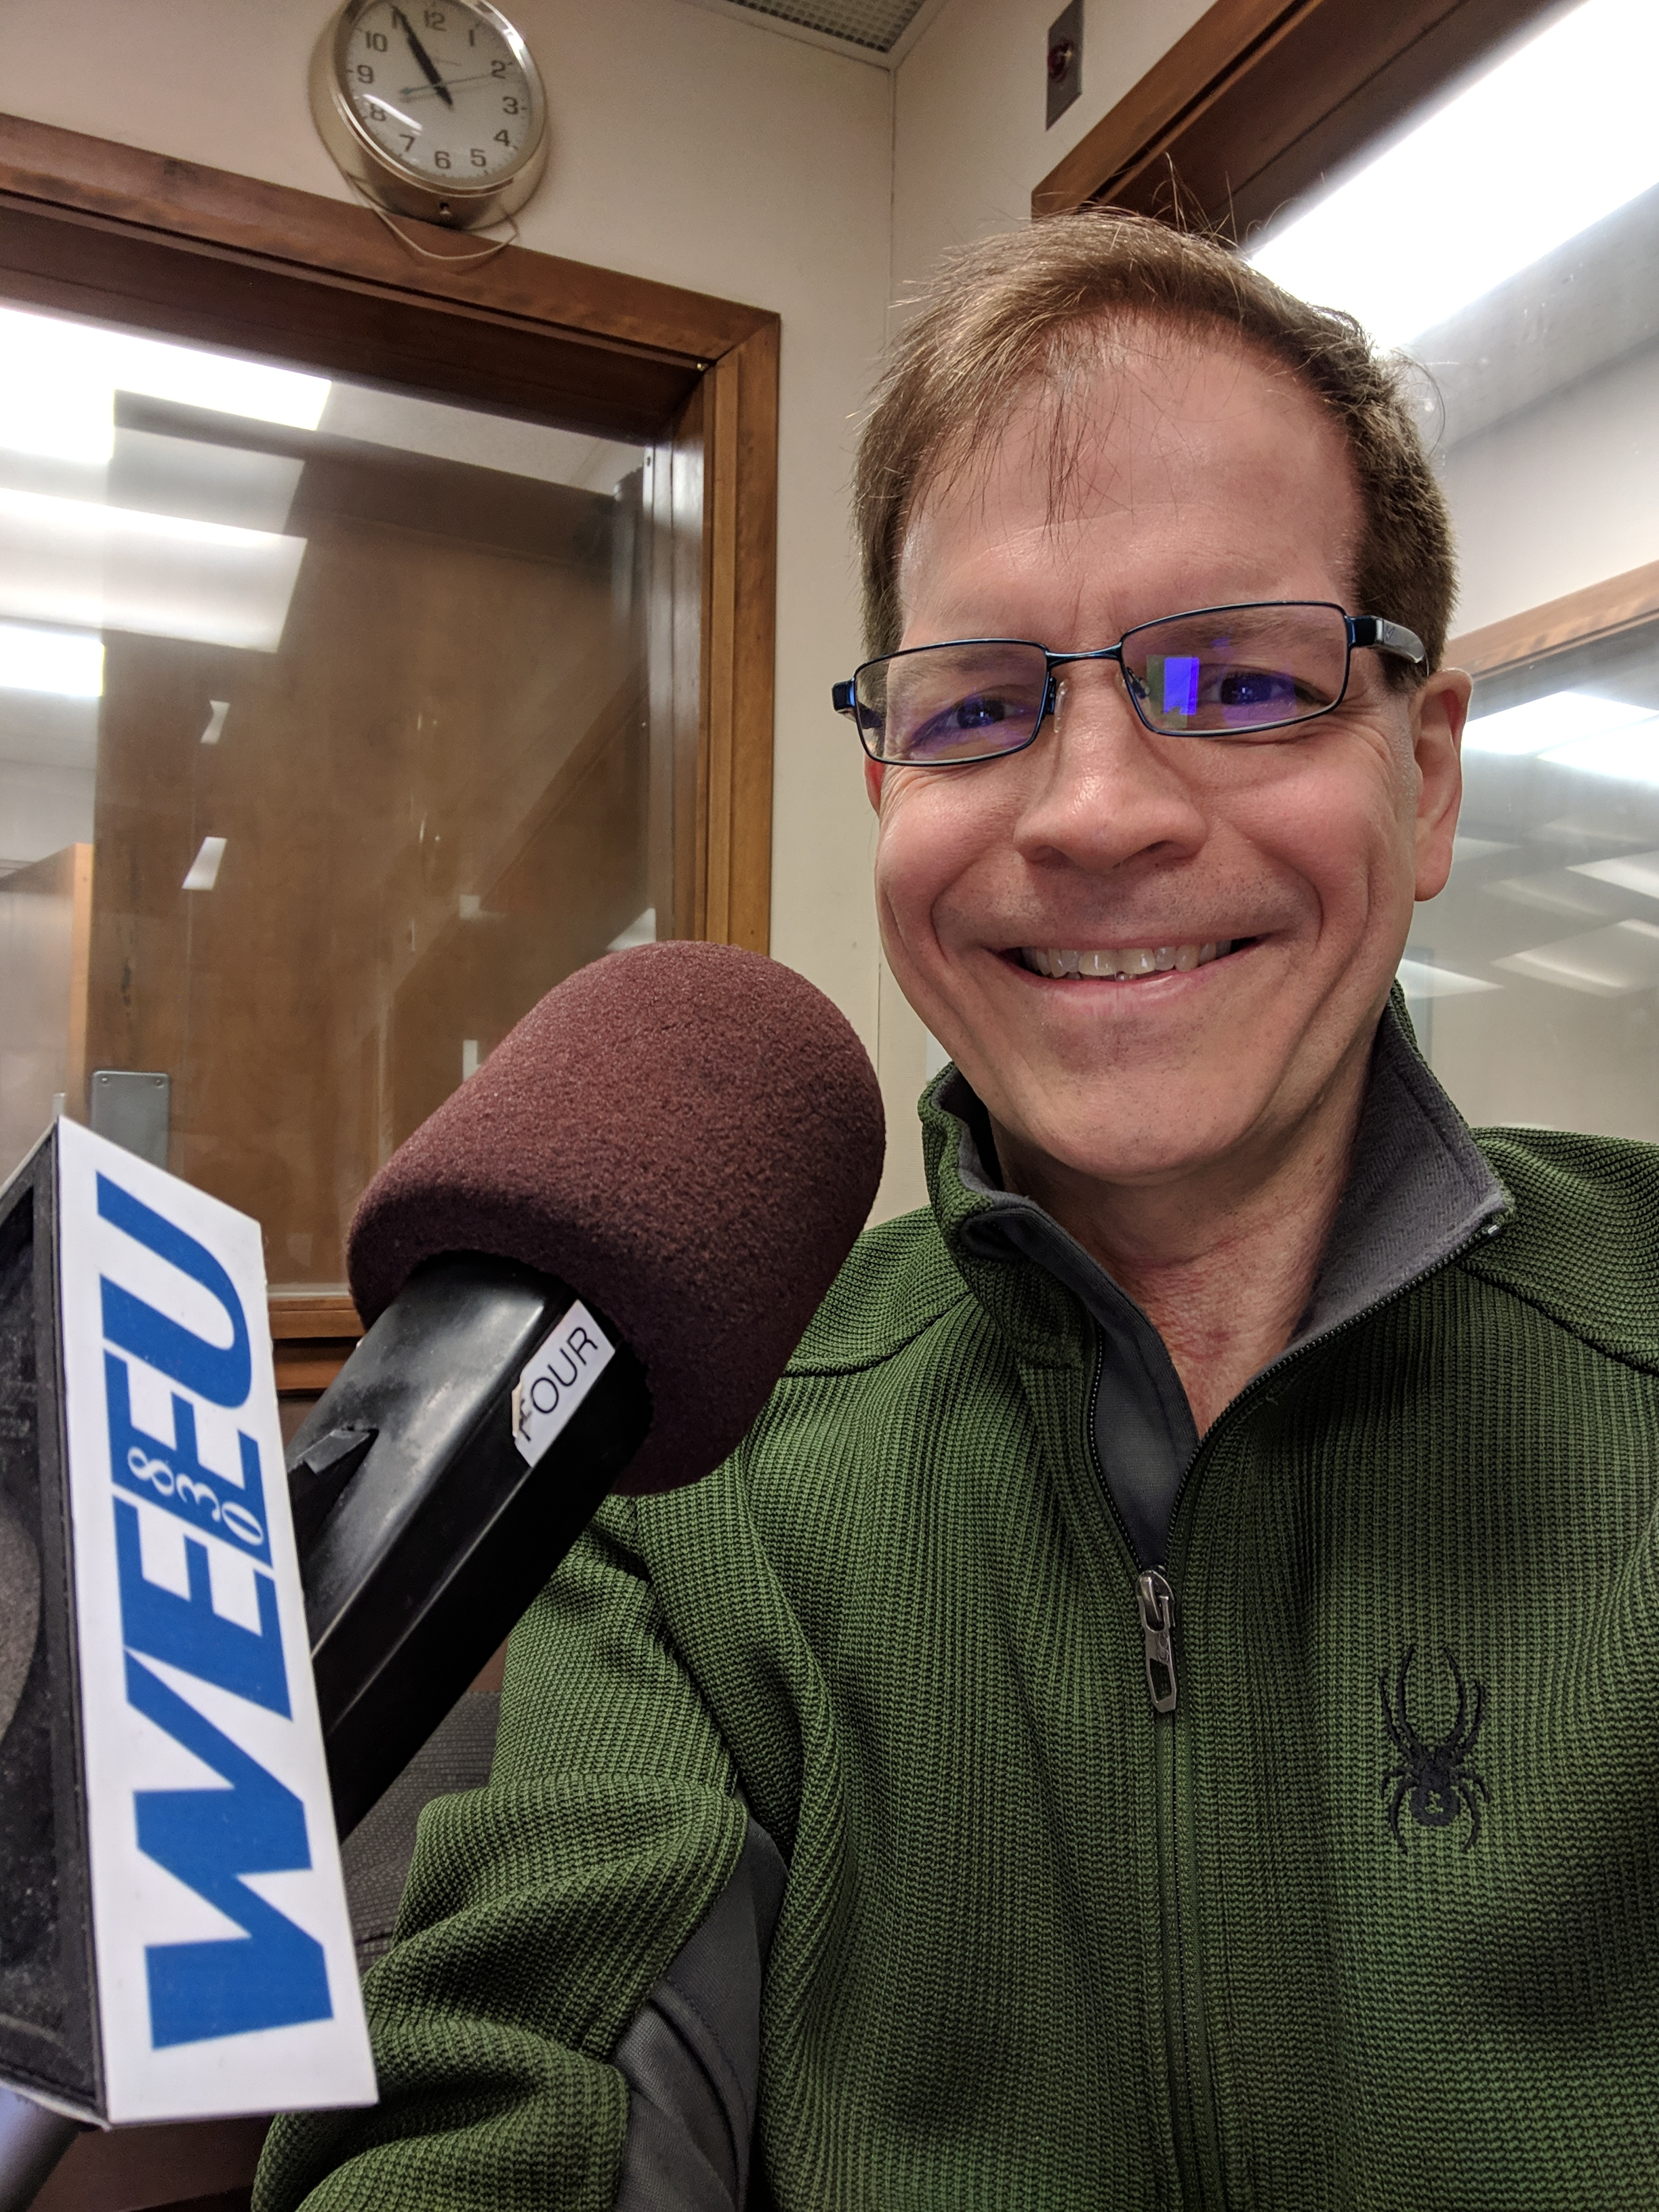 Jeff at WEEU January 14 2019.jpg